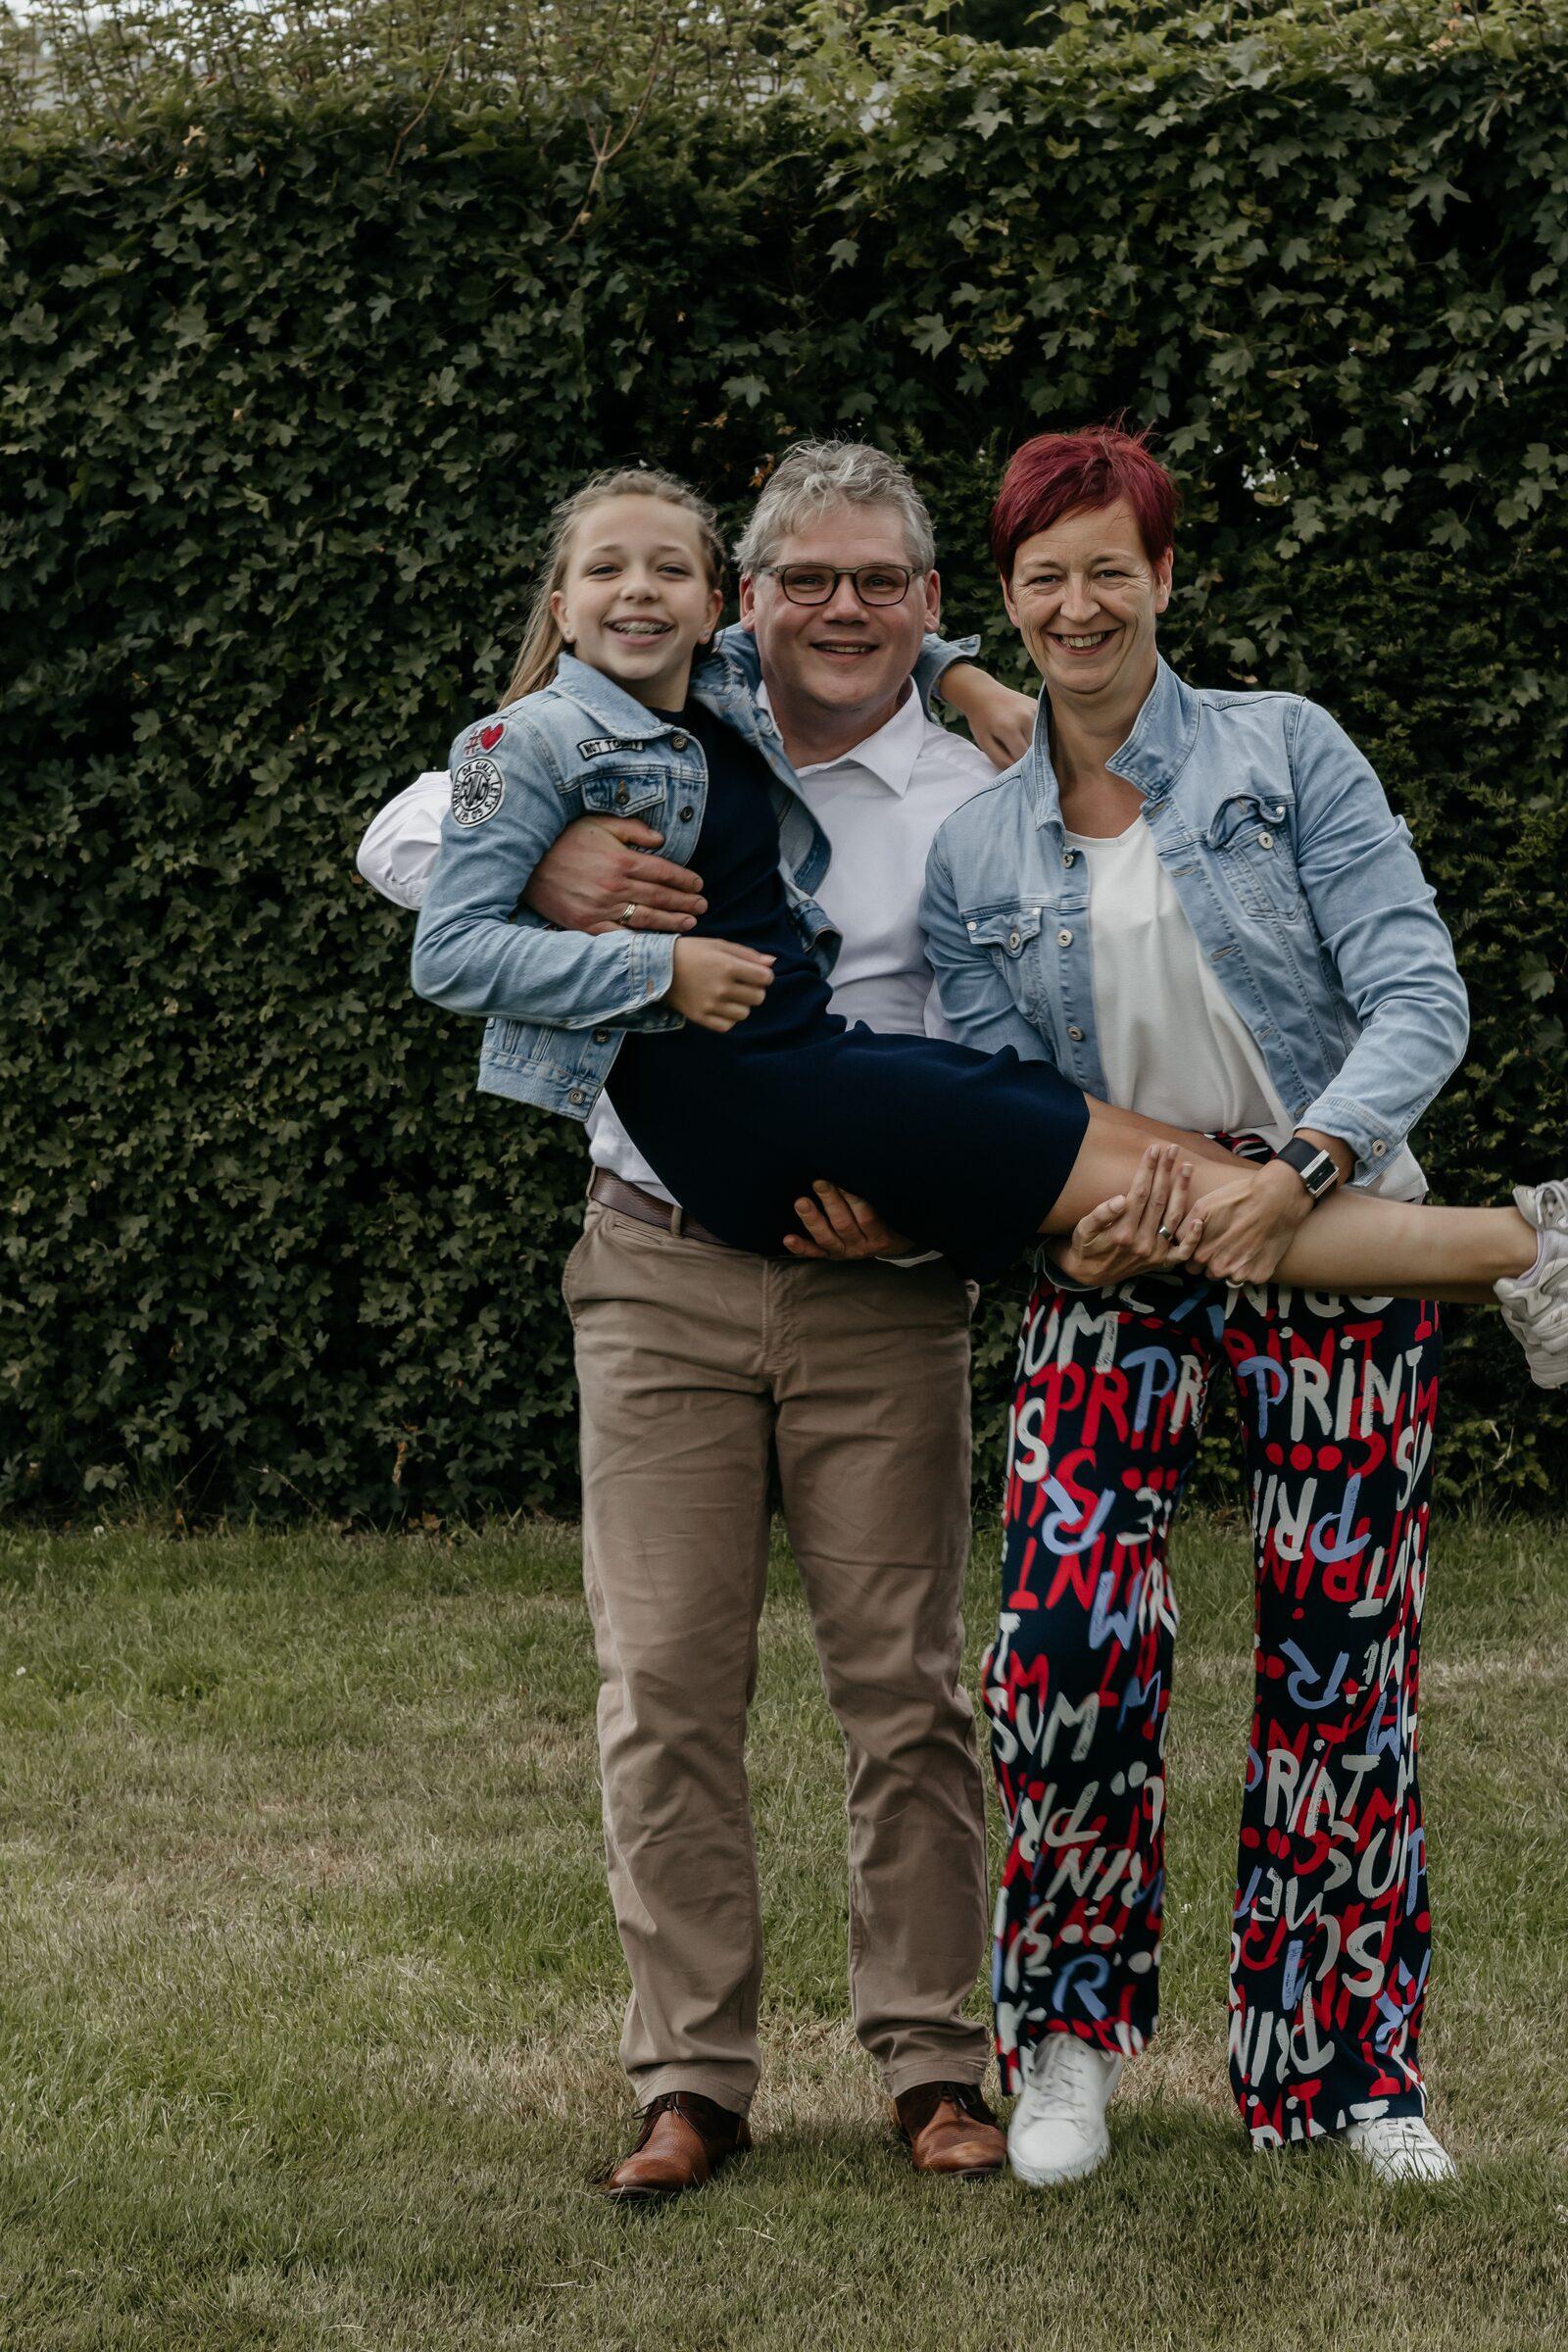 Merle, Bert-Jan & Dini Hoekjen